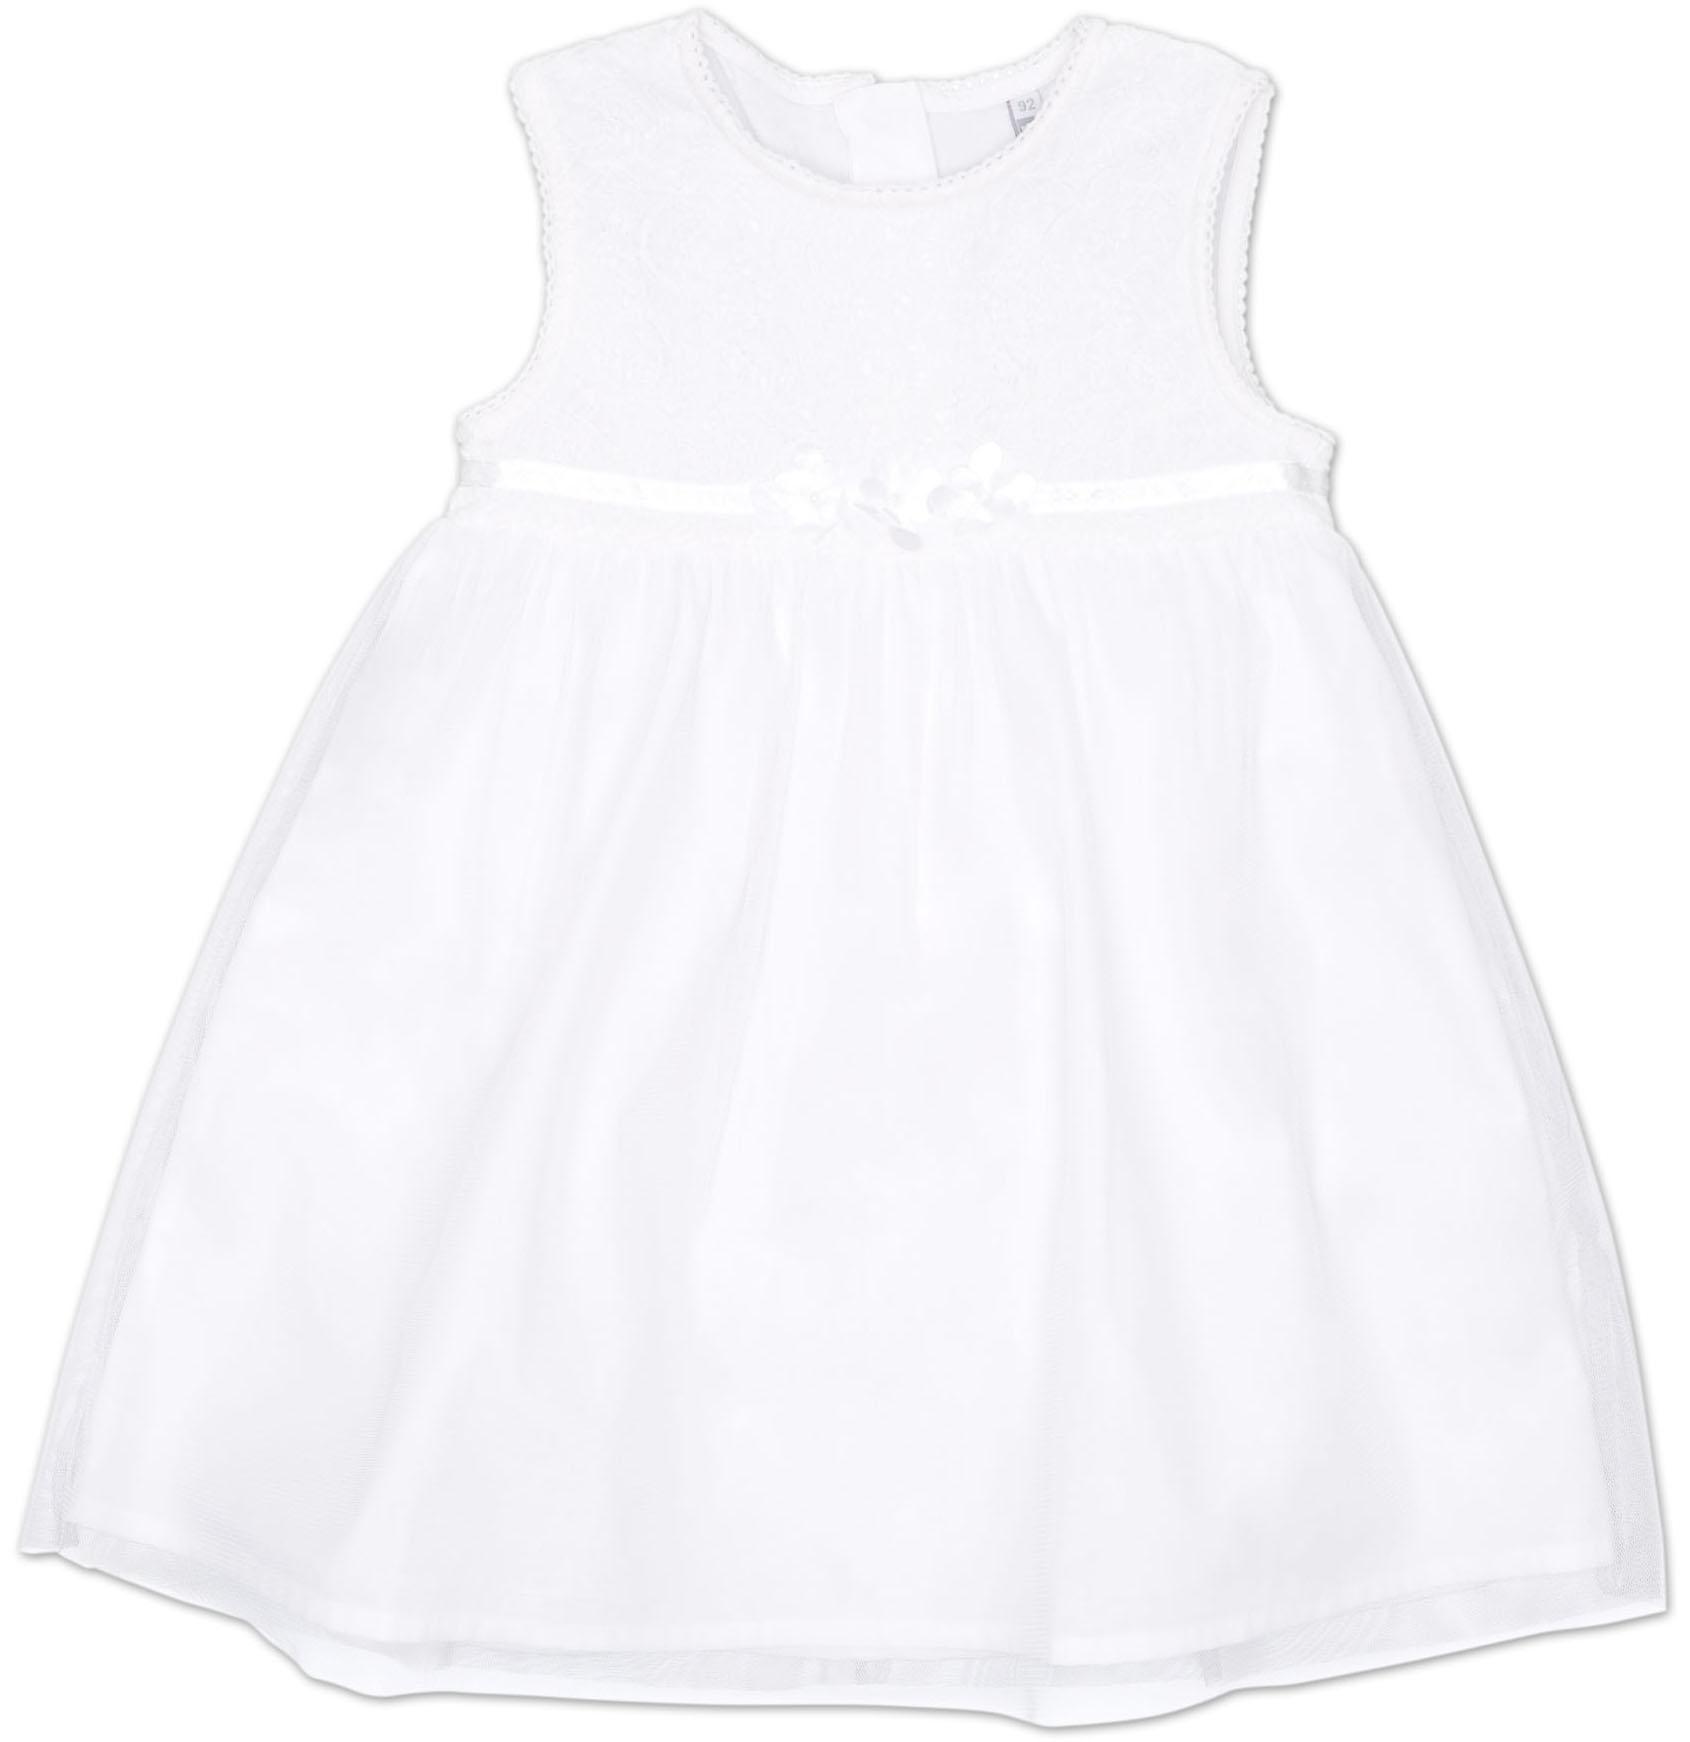 Платья Barkito Платье без рукавов Barkito, Алоха Гавайи!, белое printio платье без рукавов